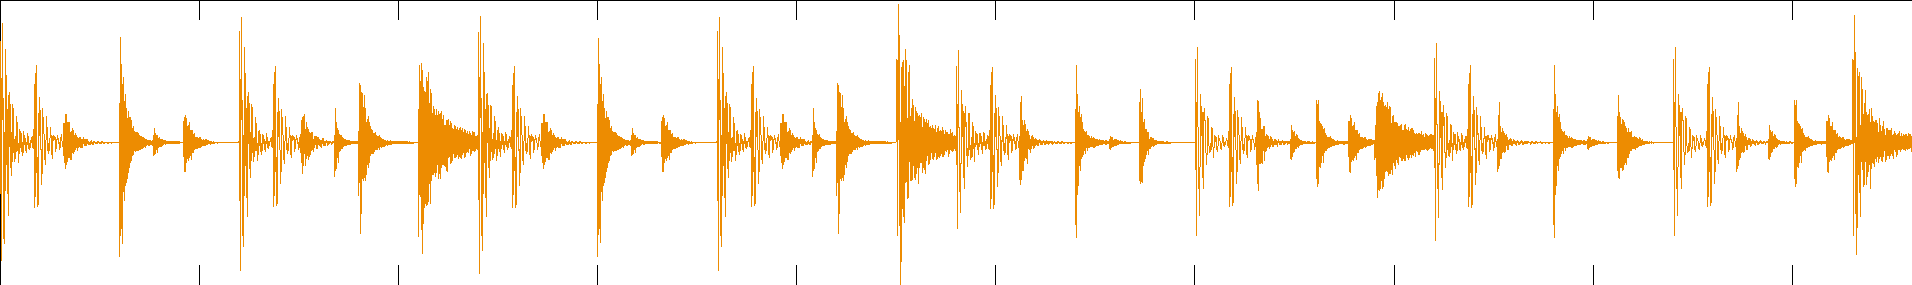 WaveDrum02_58_MIX